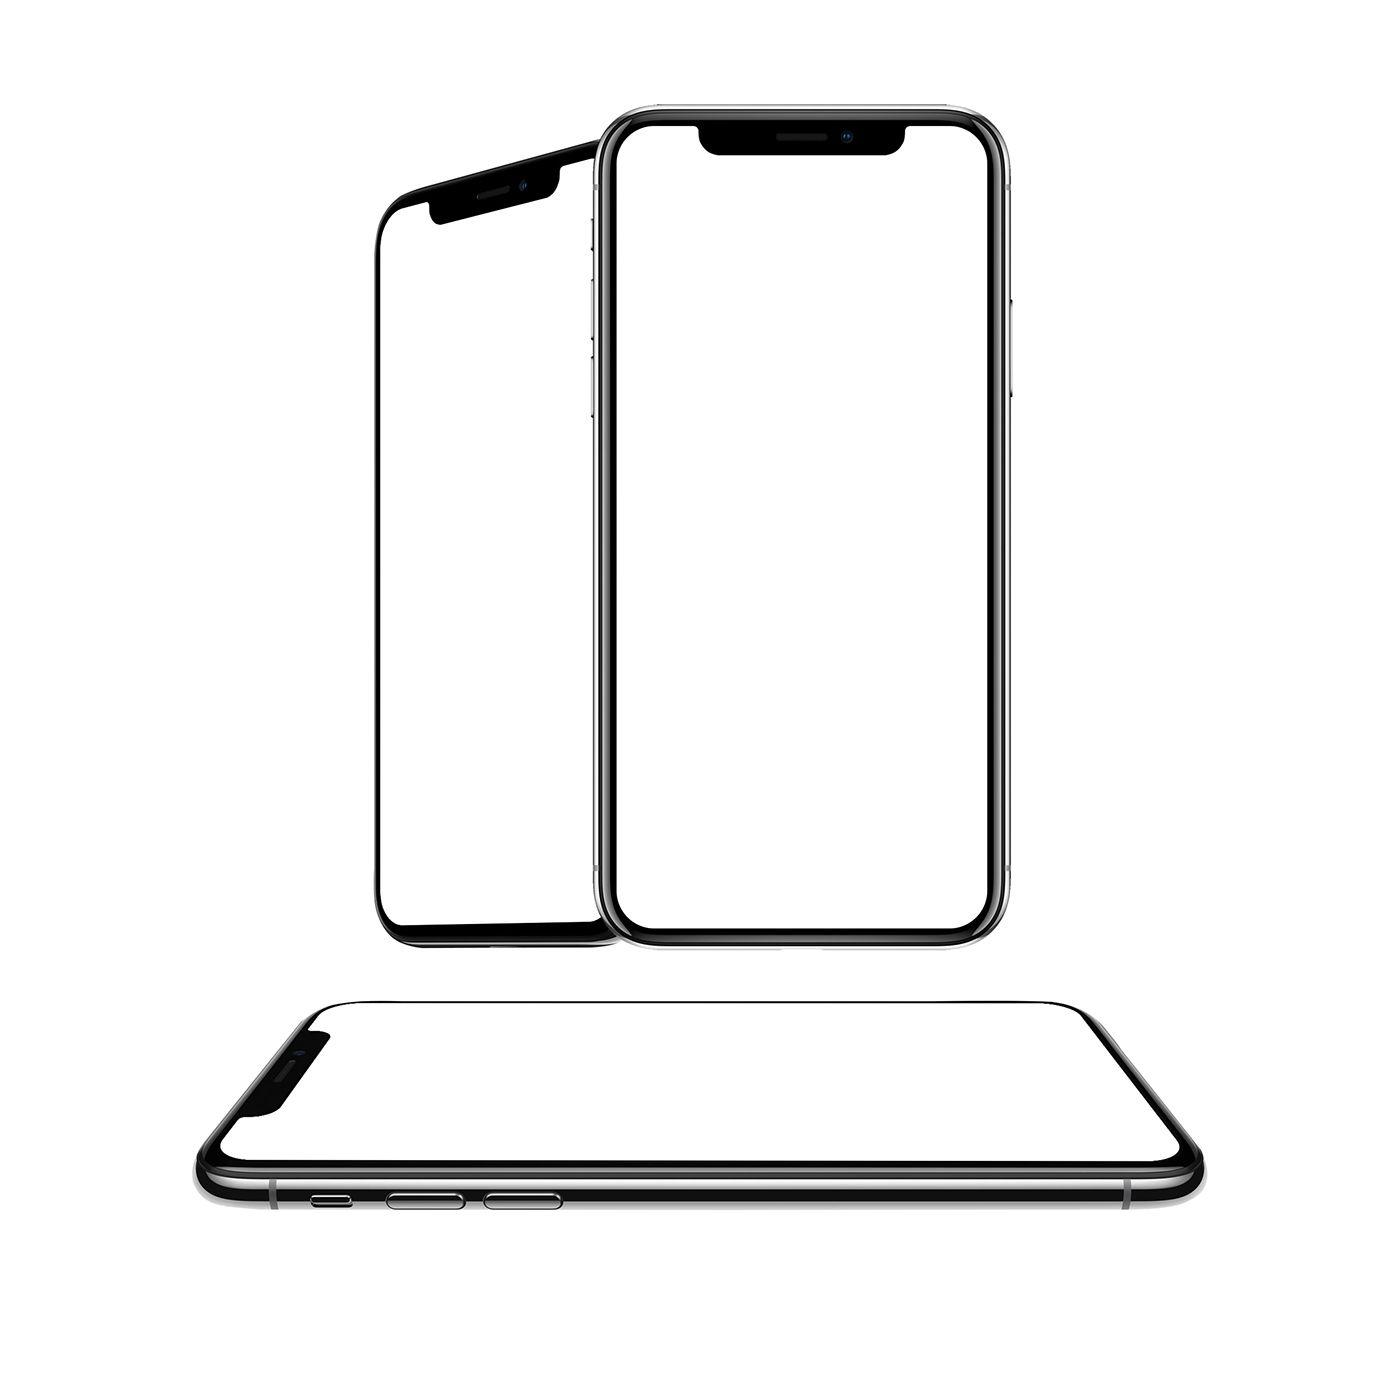 Download Iphone X Mockup 3 Views Pinspiry Mockup Free Download Free Mockup Mockup